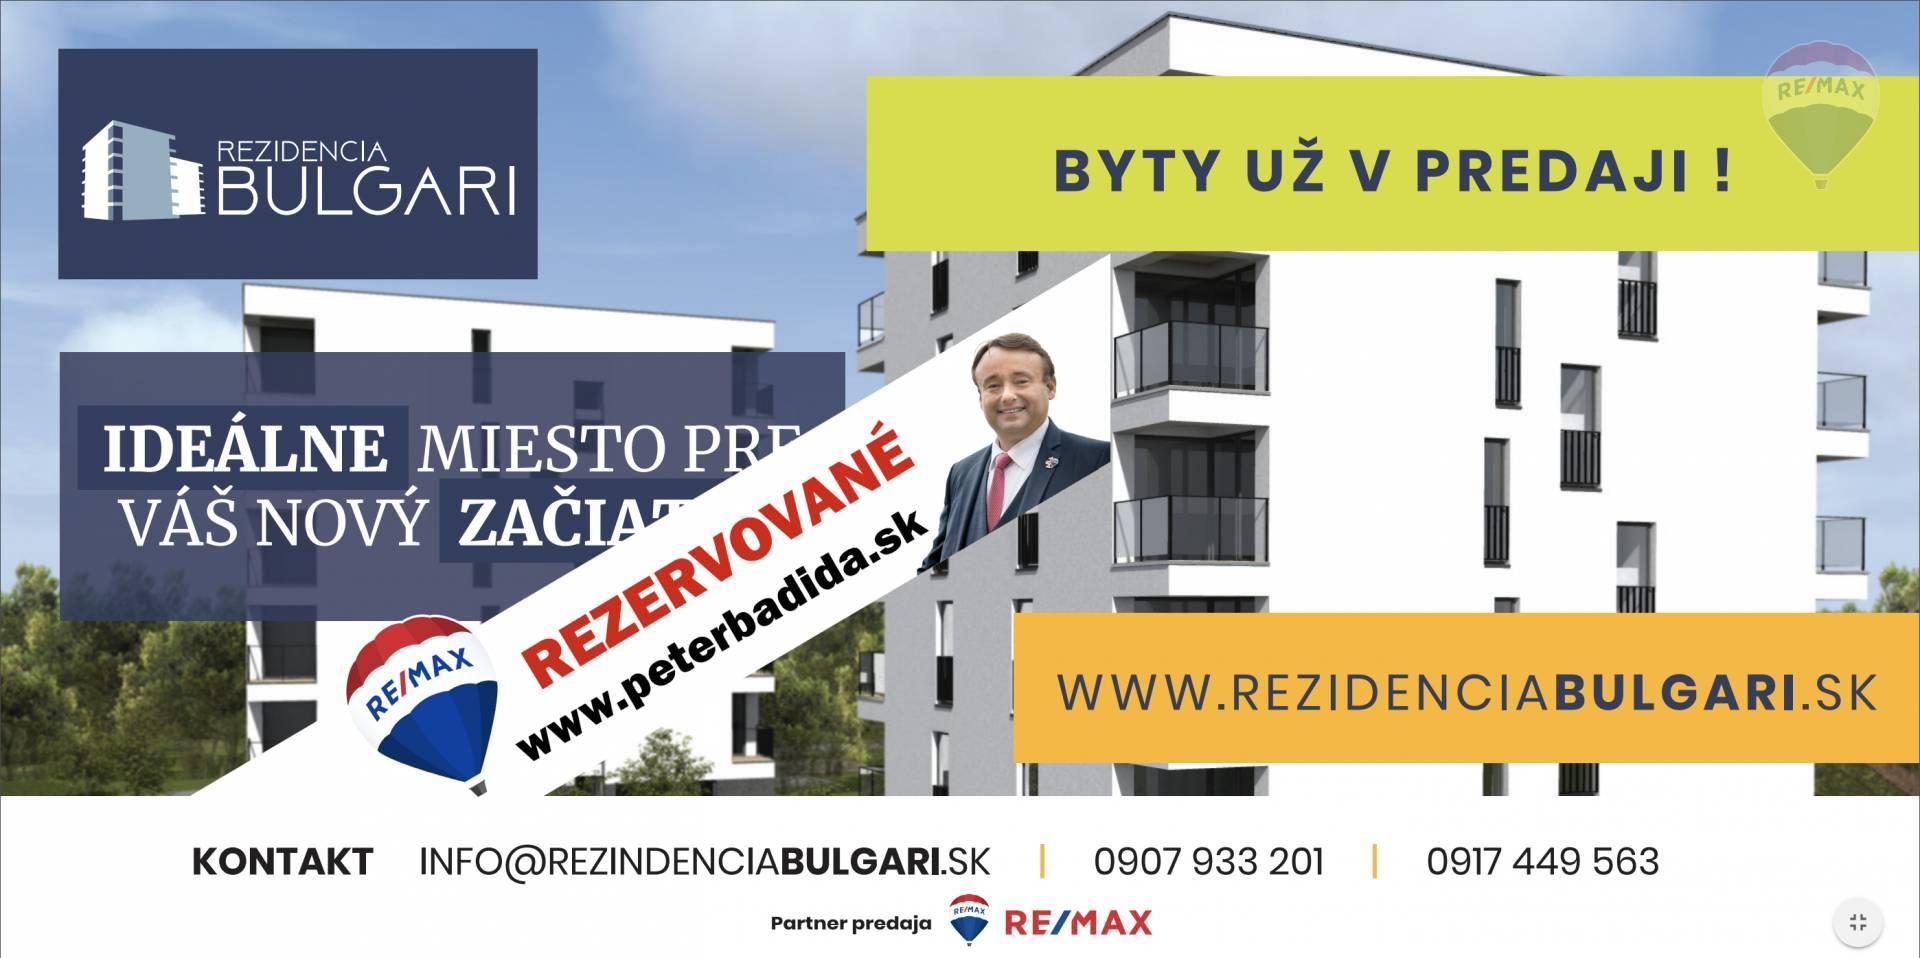 ---R E Z E R V O V A N É--- Na predaj 2 izbový byt Bulharská ulica v Prešove